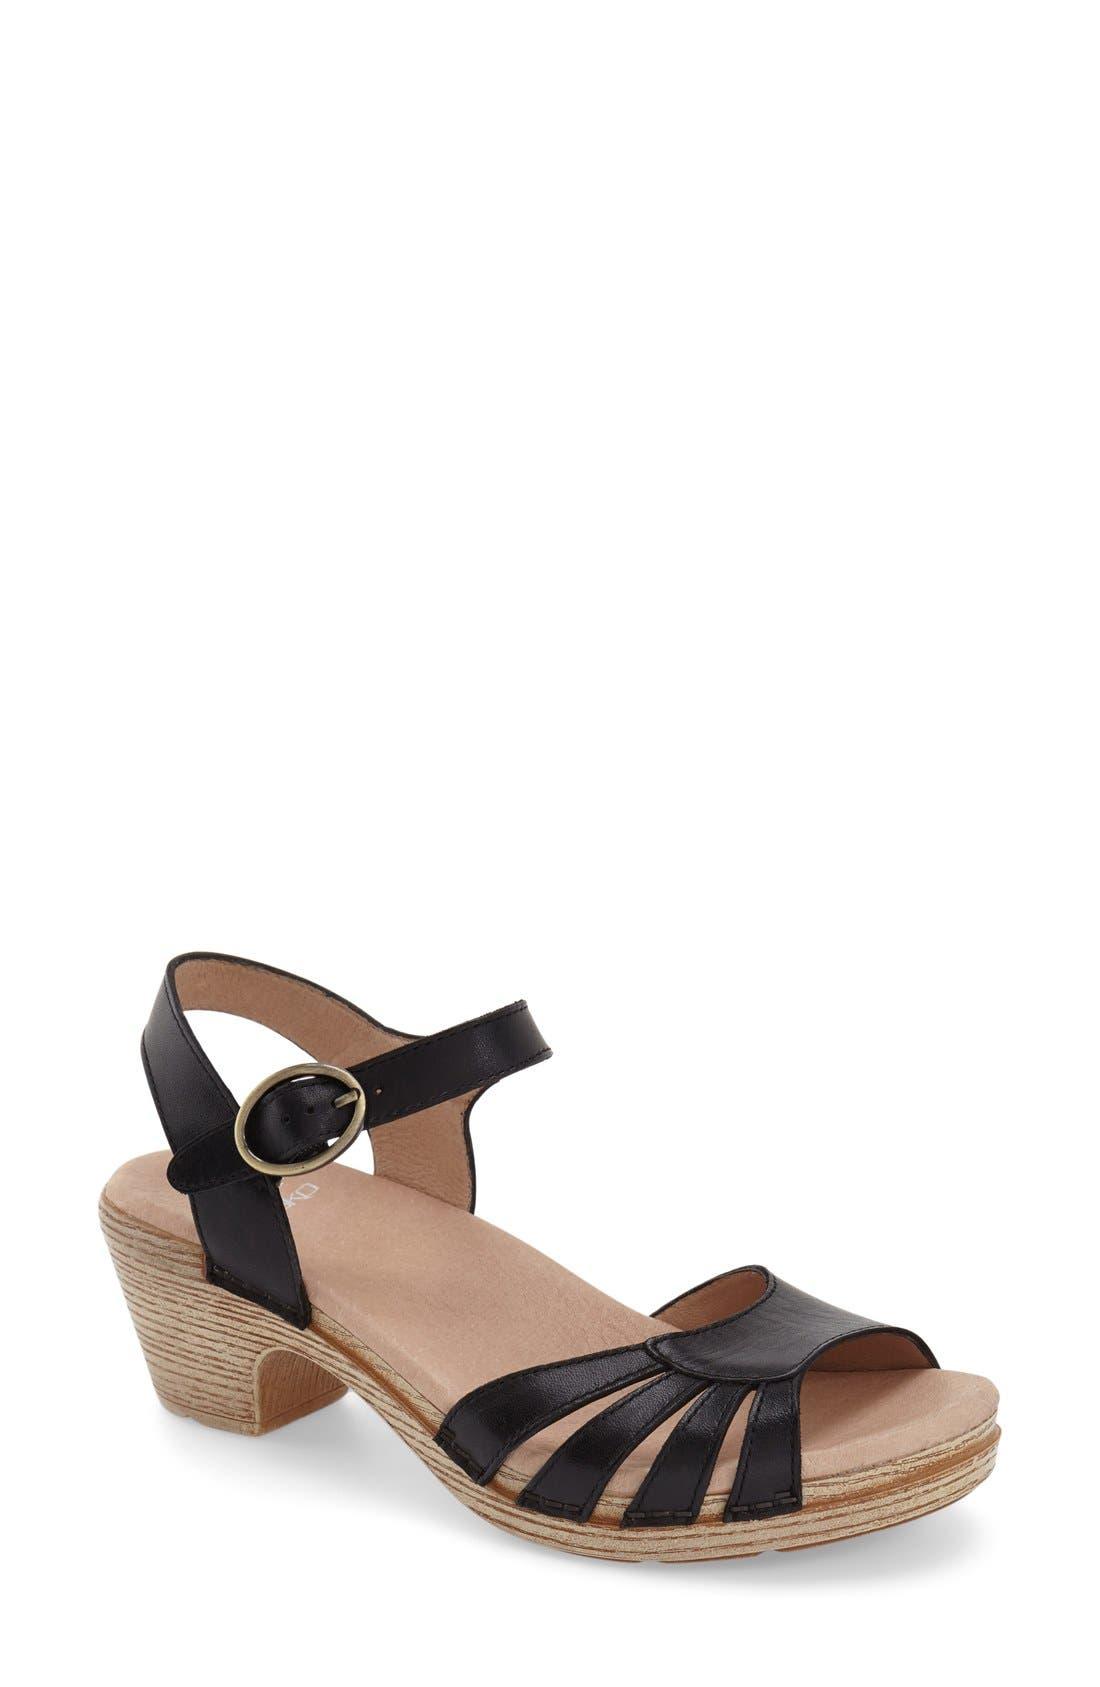 DANSKO 'Marlow' Sandal